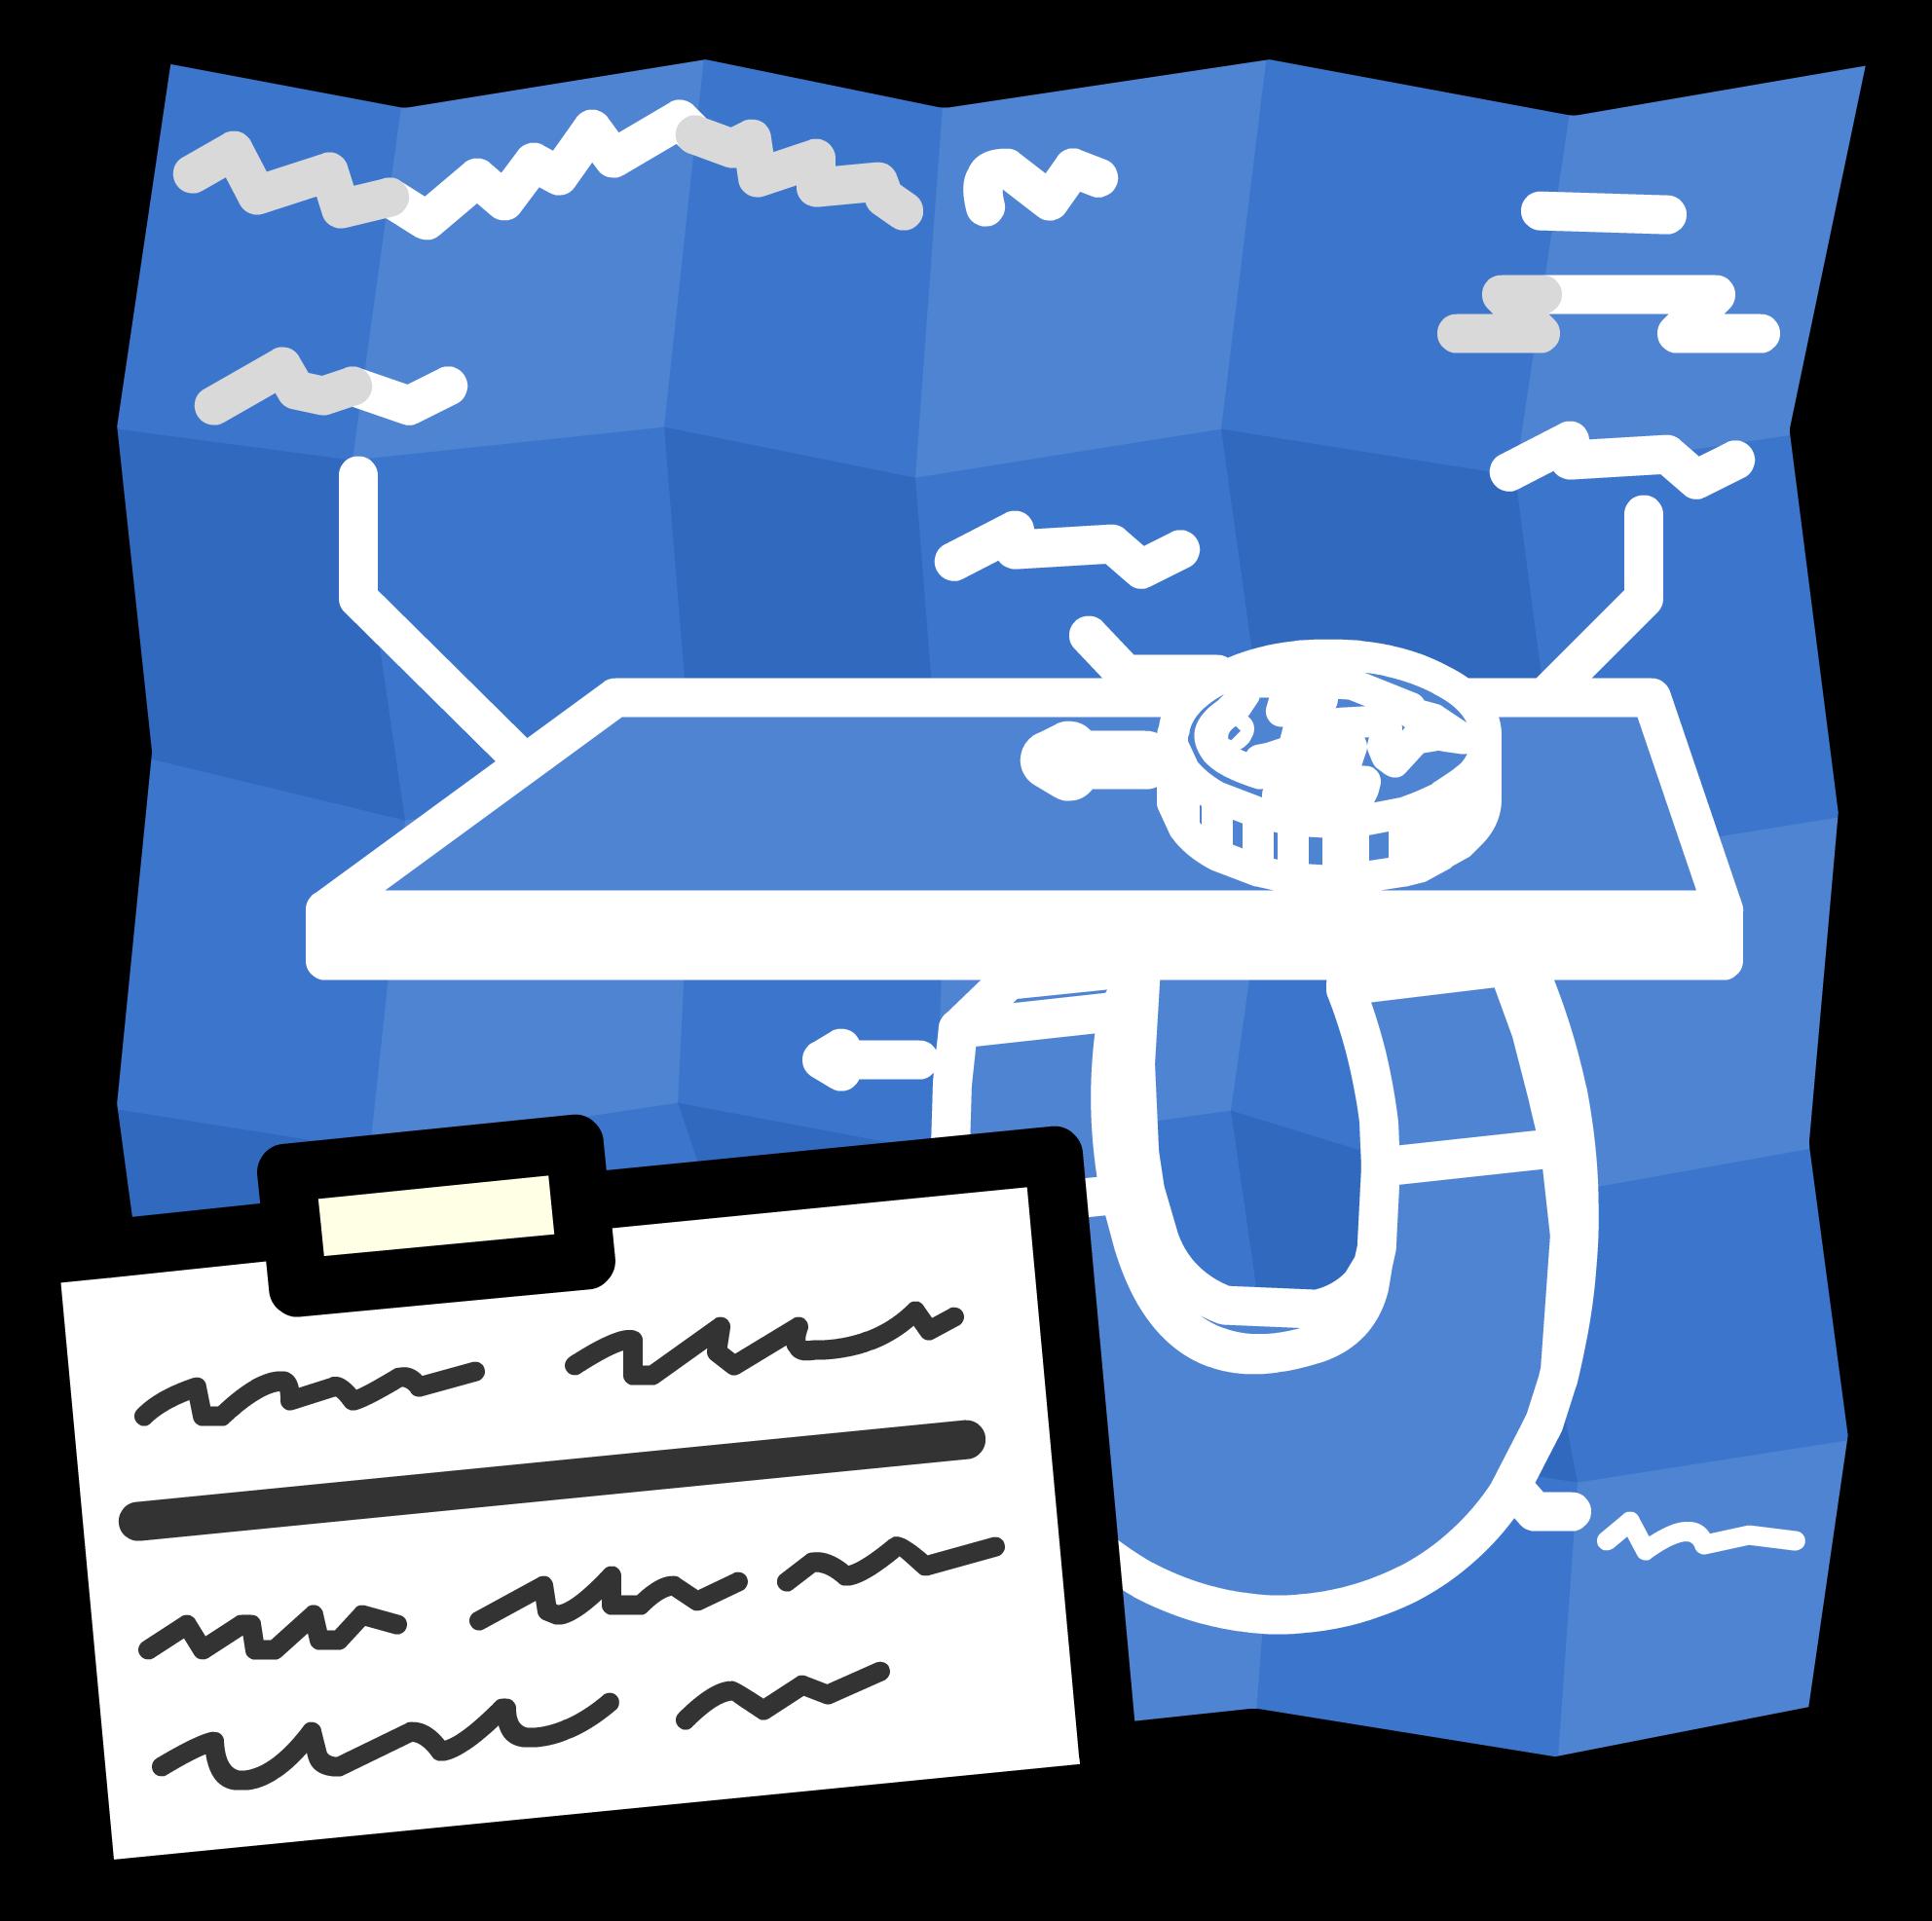 Magnet blueprints club penguin wiki fandom powered by wikia magnet blueprints malvernweather Gallery